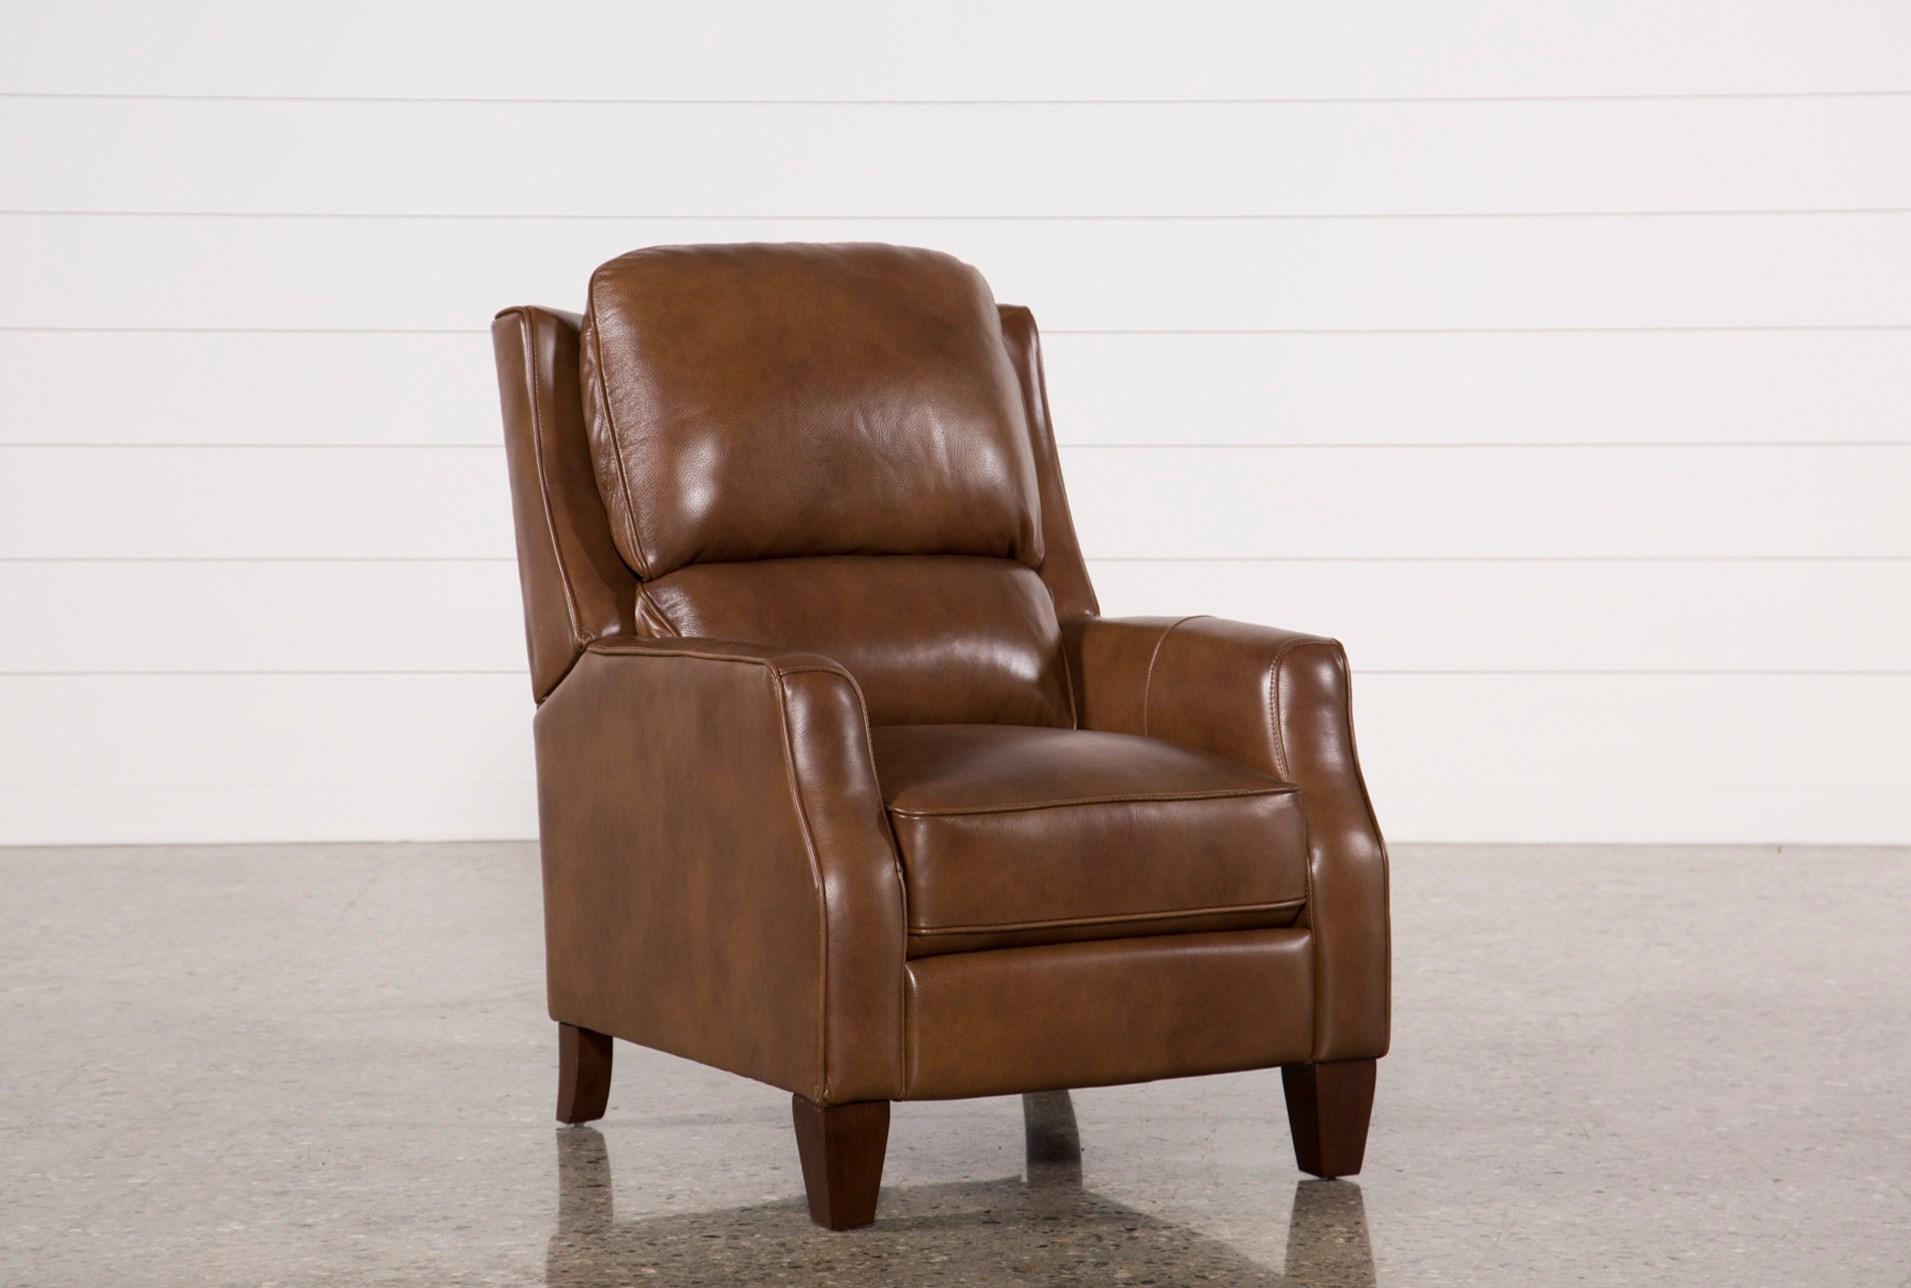 Famous Douglas Caramel Leather High Leg Recliner | Living Spaces LW12